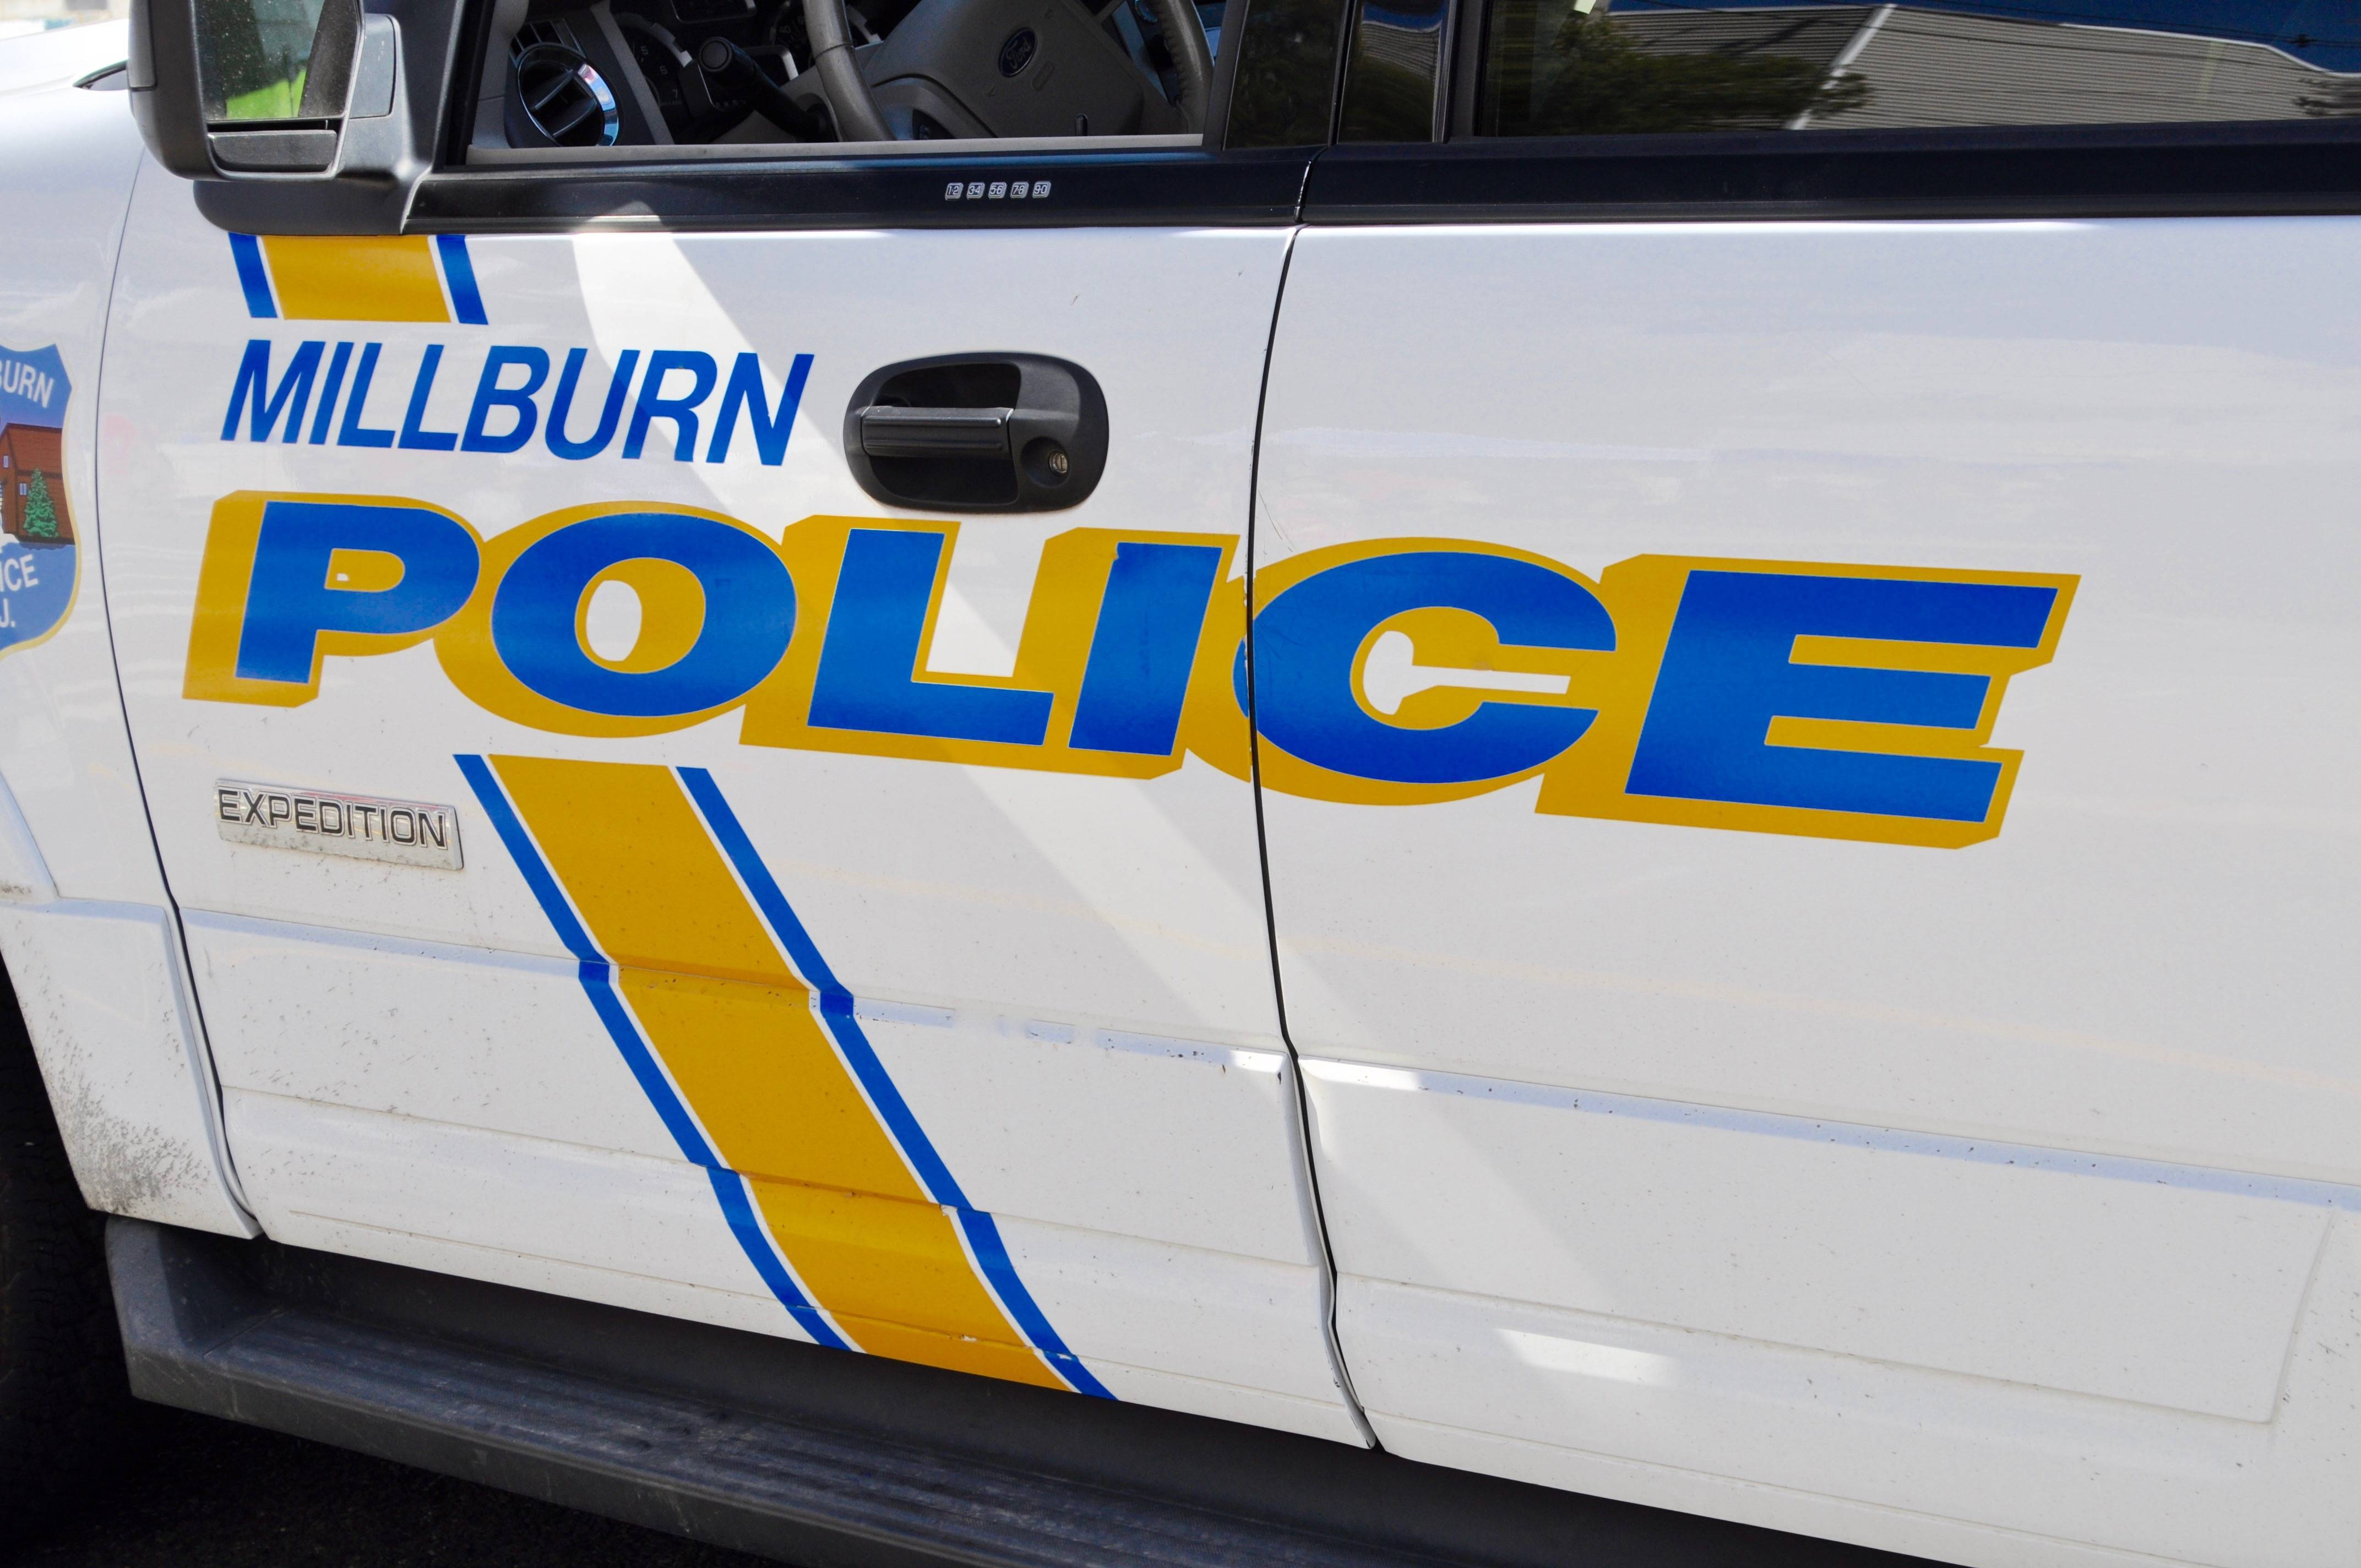 934457c1a734240462c6_millburn_police_car_photo.jpg